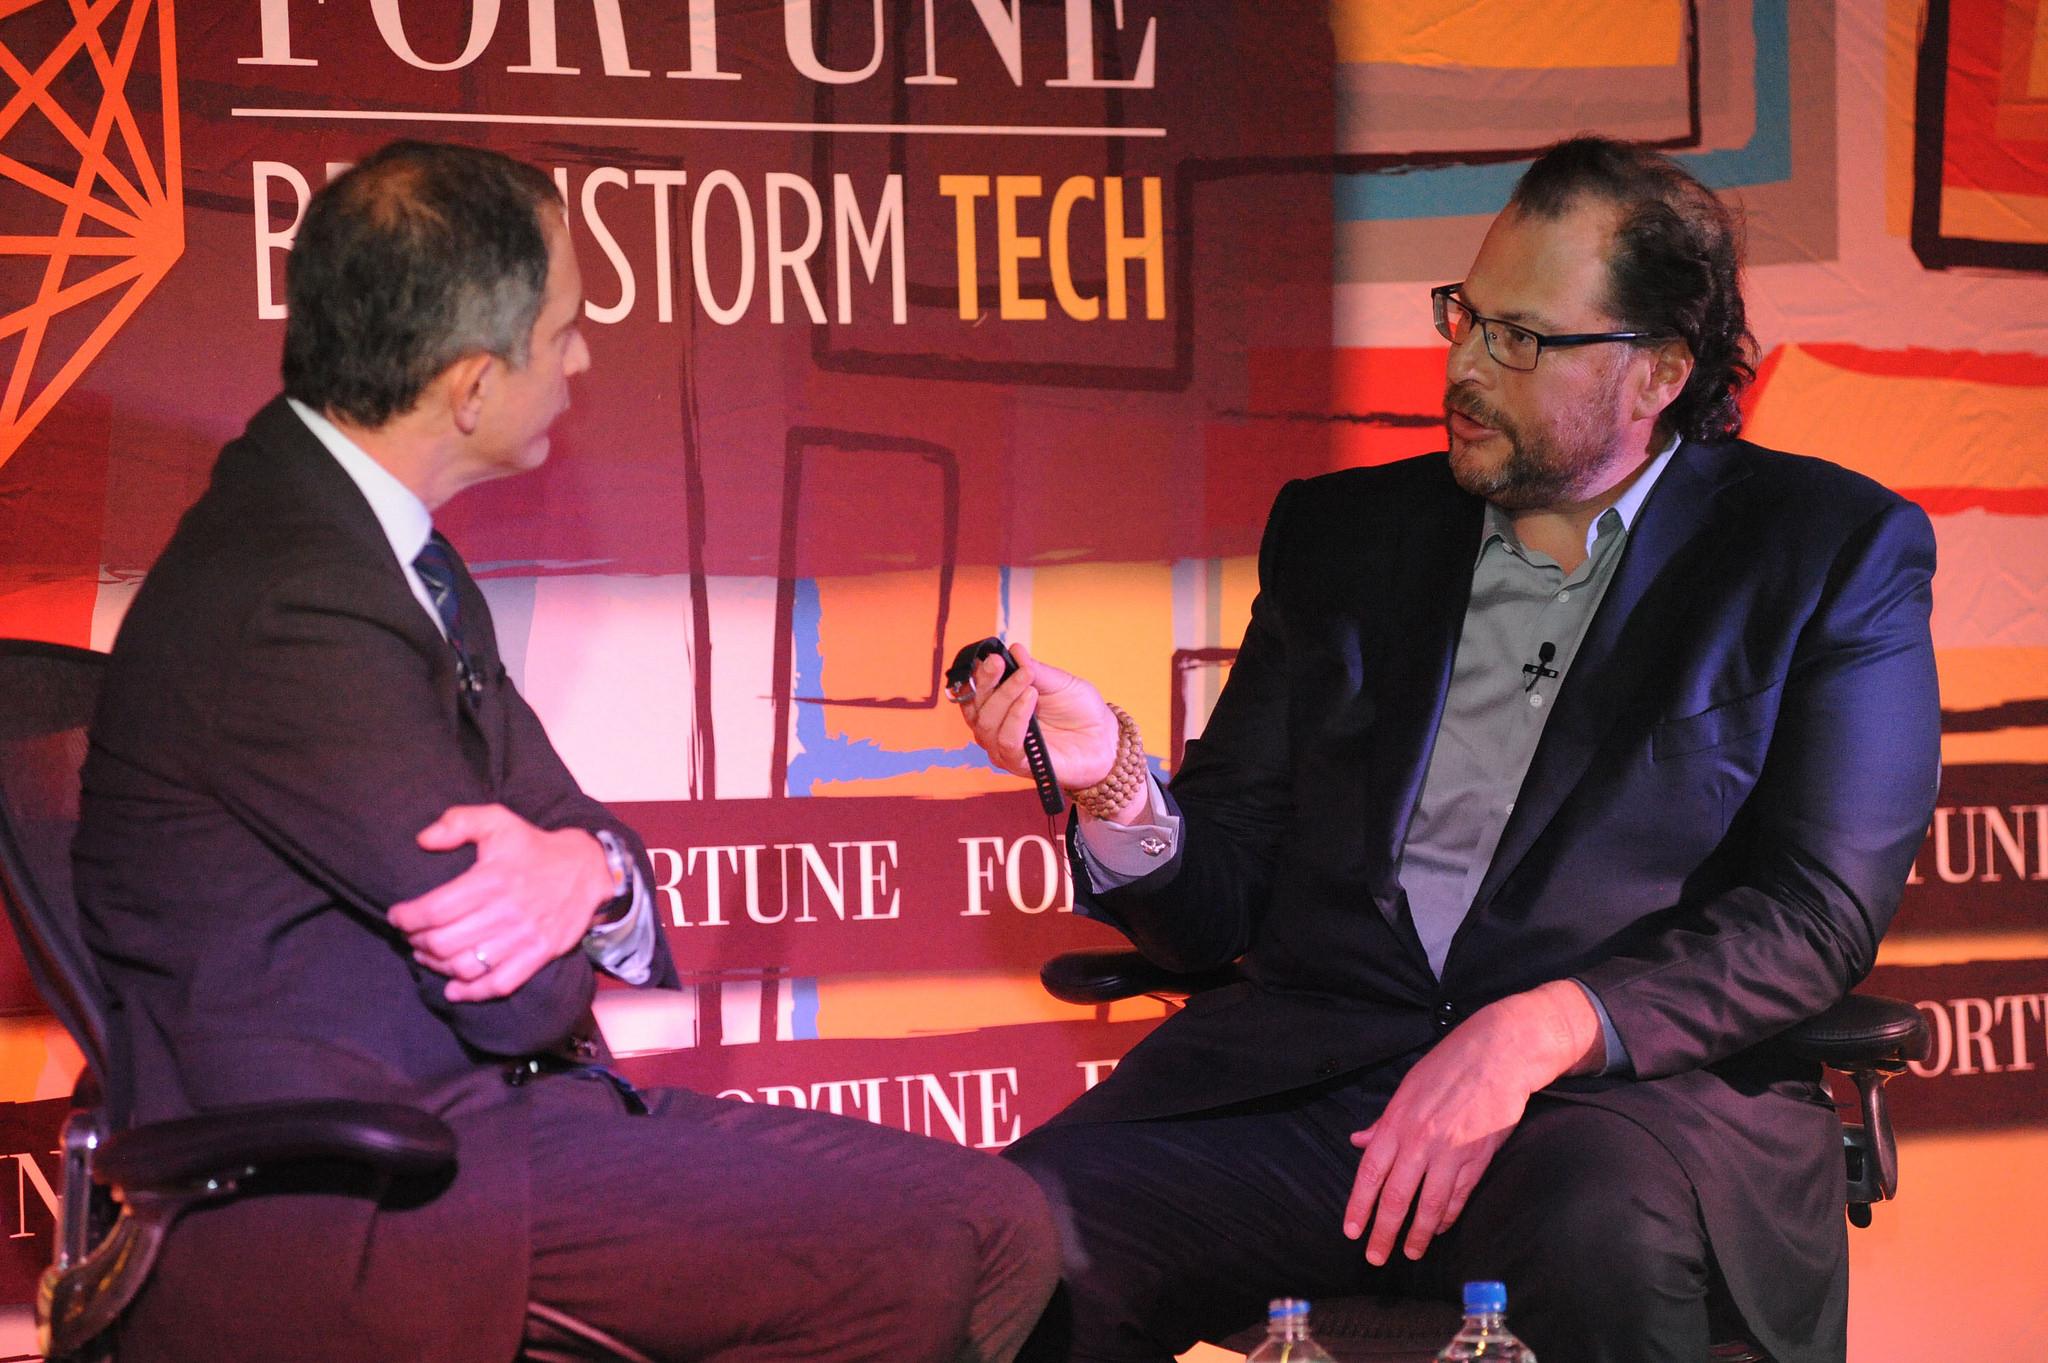 Marc Benioff Fortune Brainstorm Tech dinner Las Vegas 2015